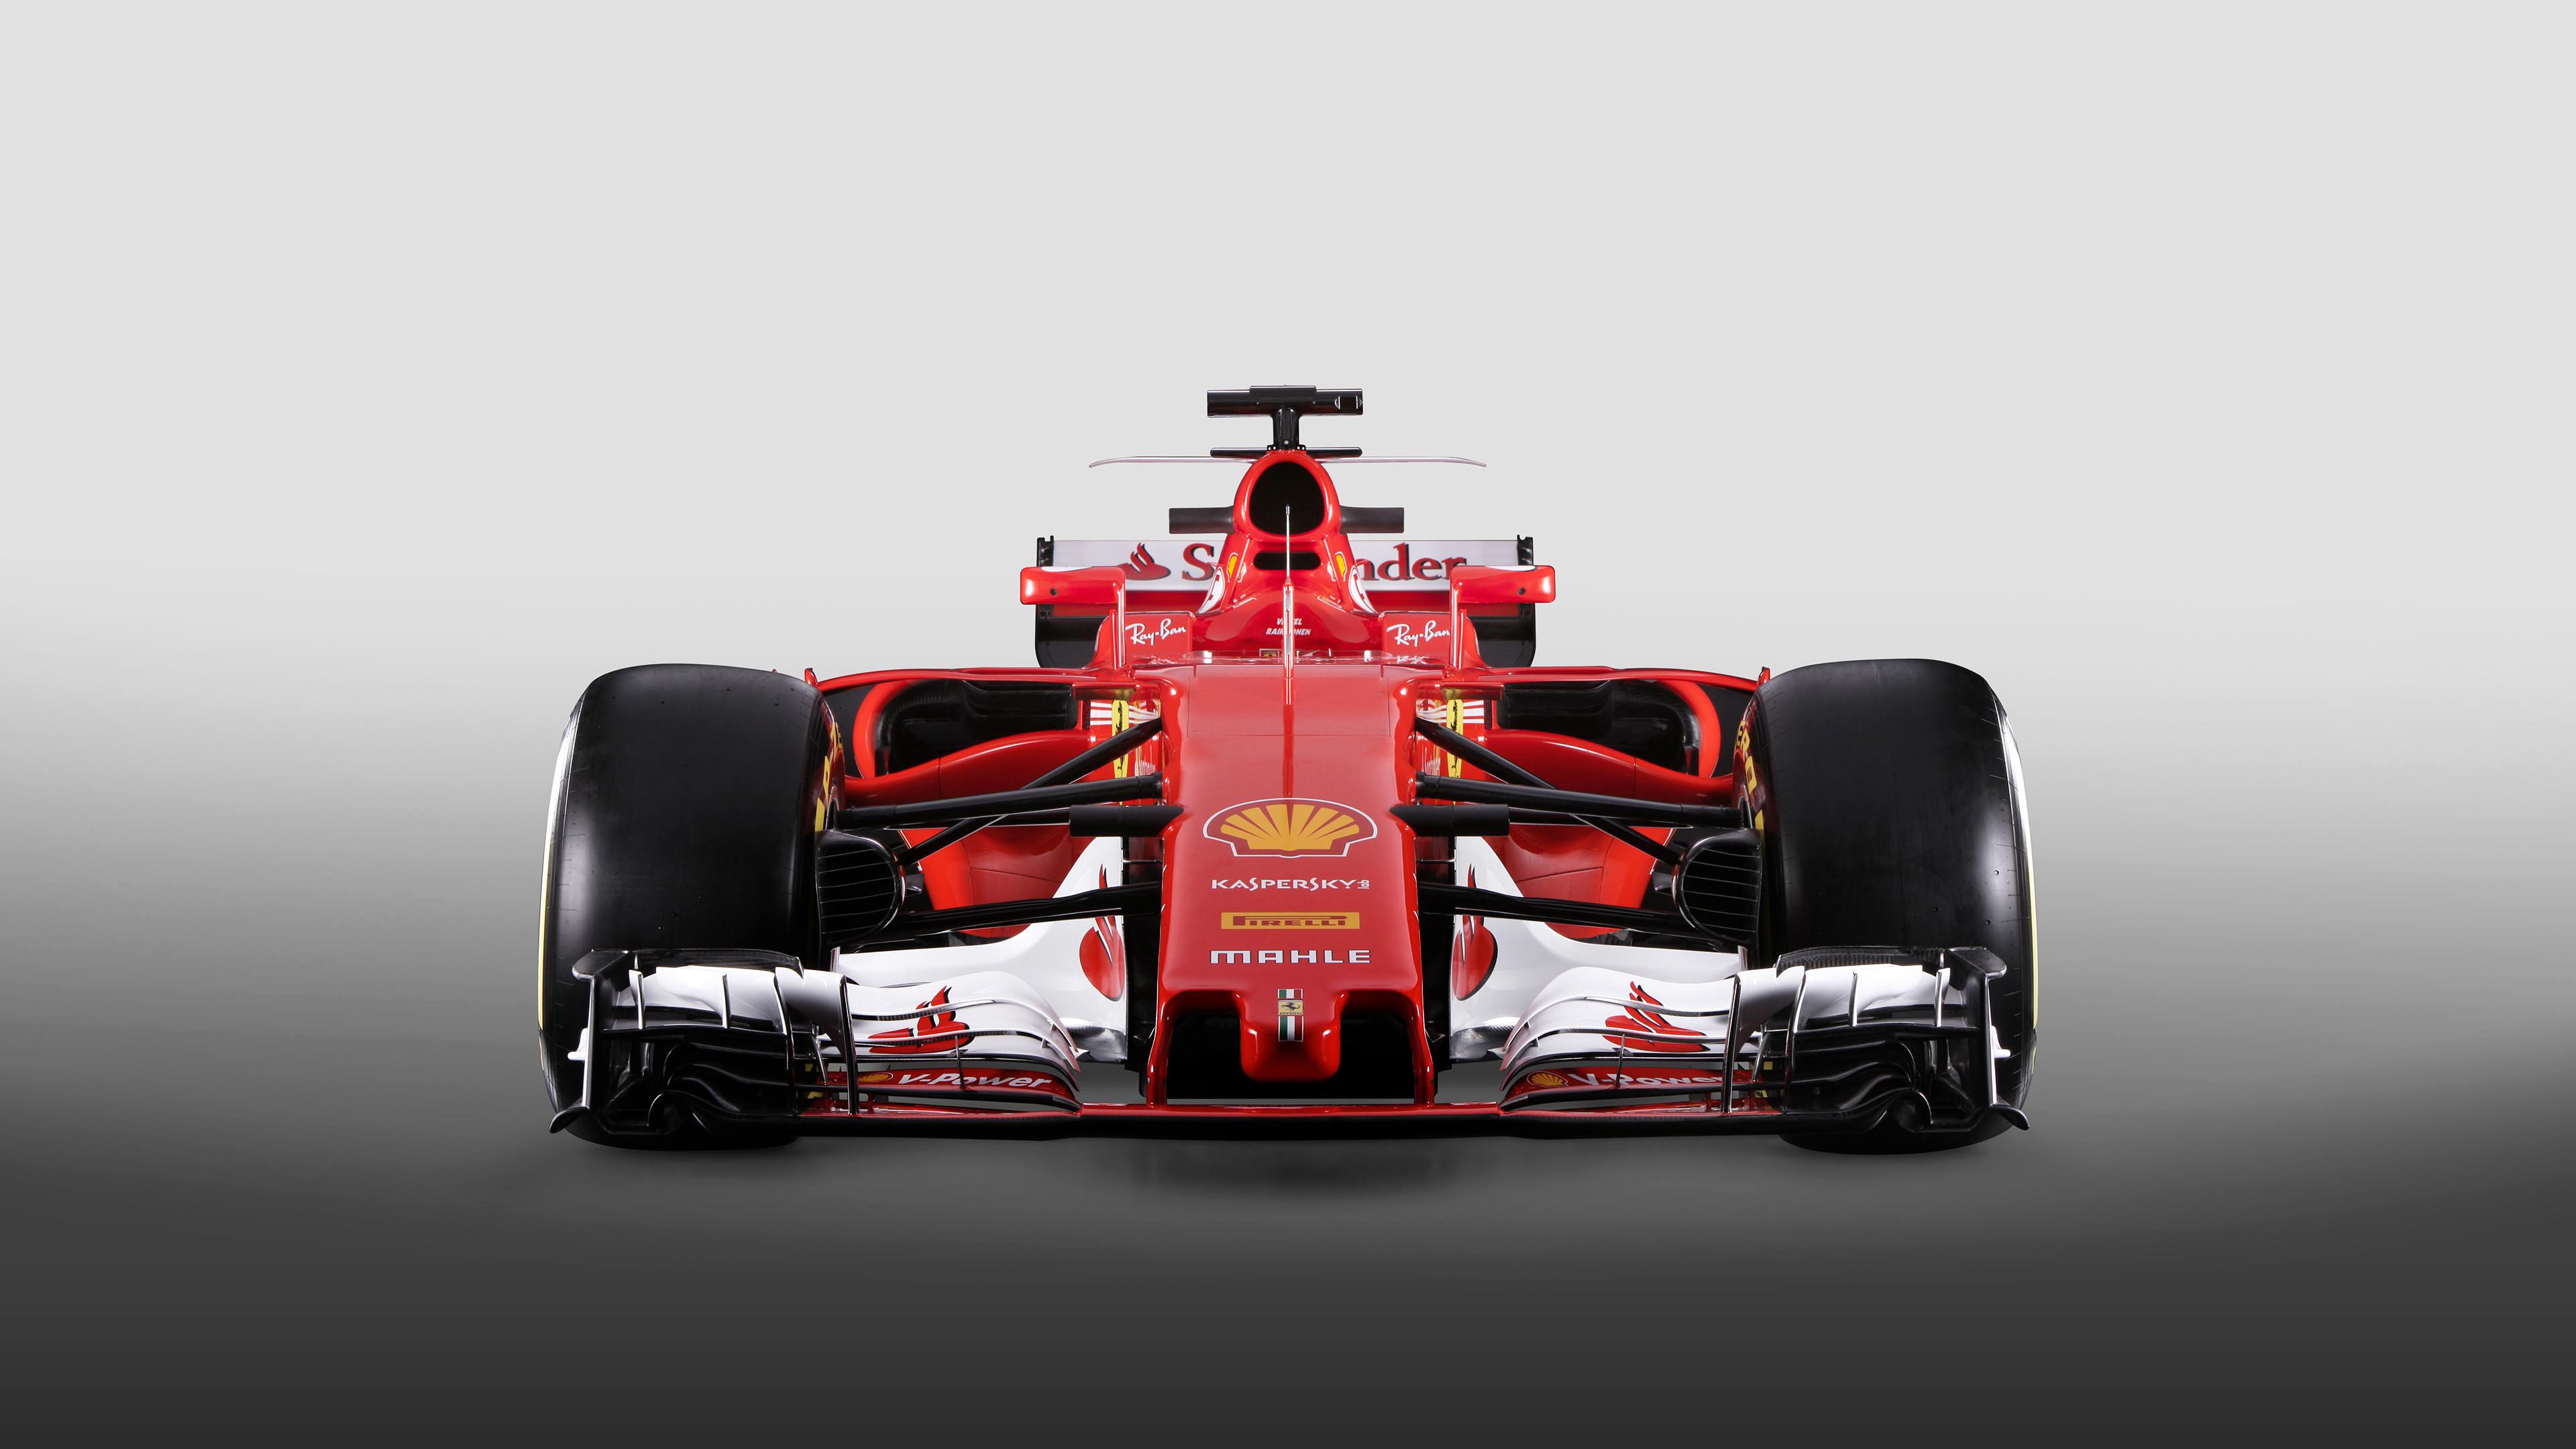 2017 Ferrari SF70H Formula 1 Car 4K